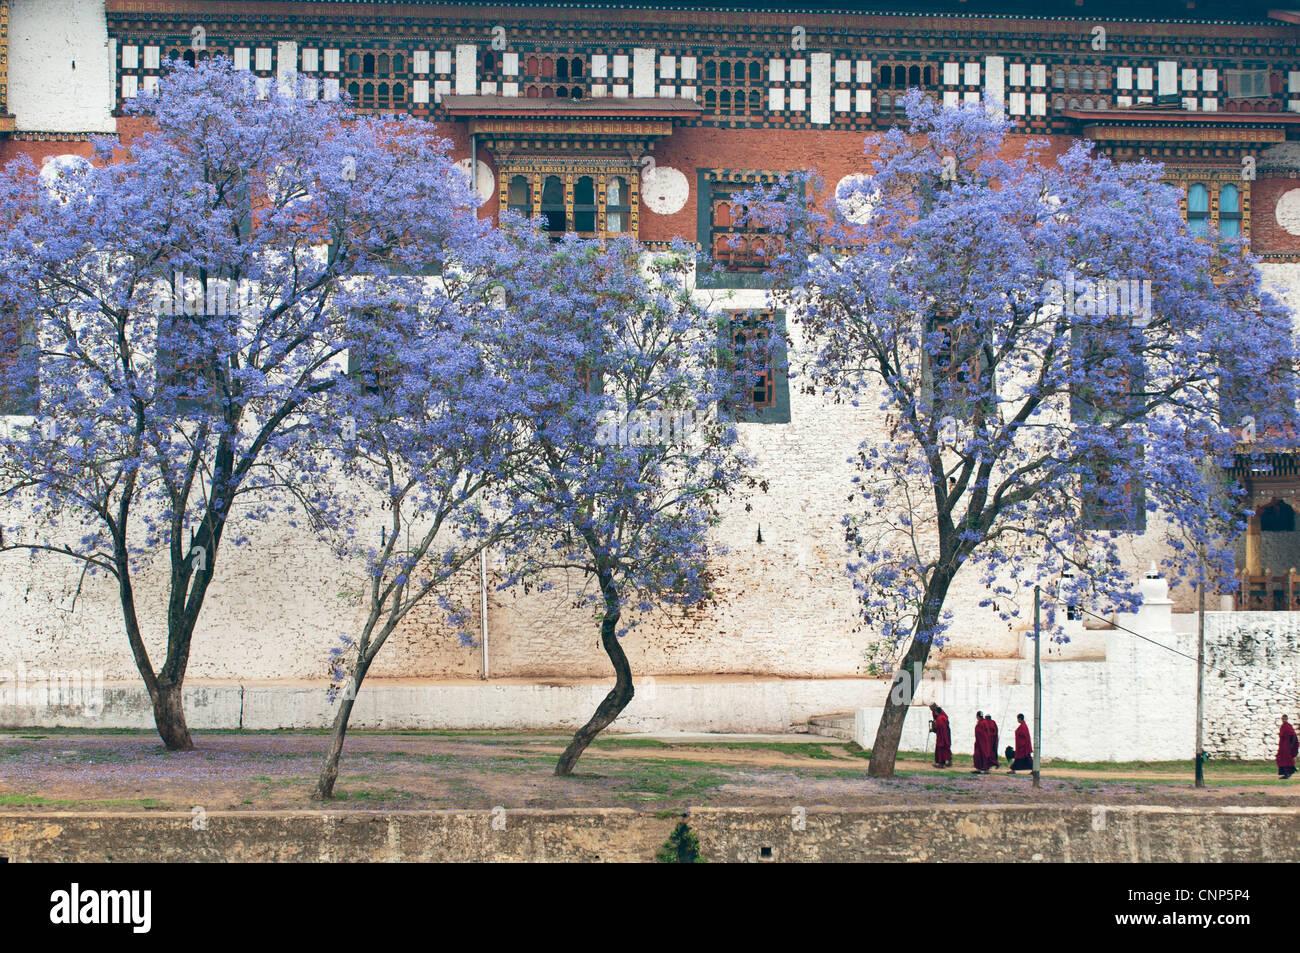 Asia, Bhutan. Monks walking by jacaranda trees outside Punakha Dzong palace - Stock Image